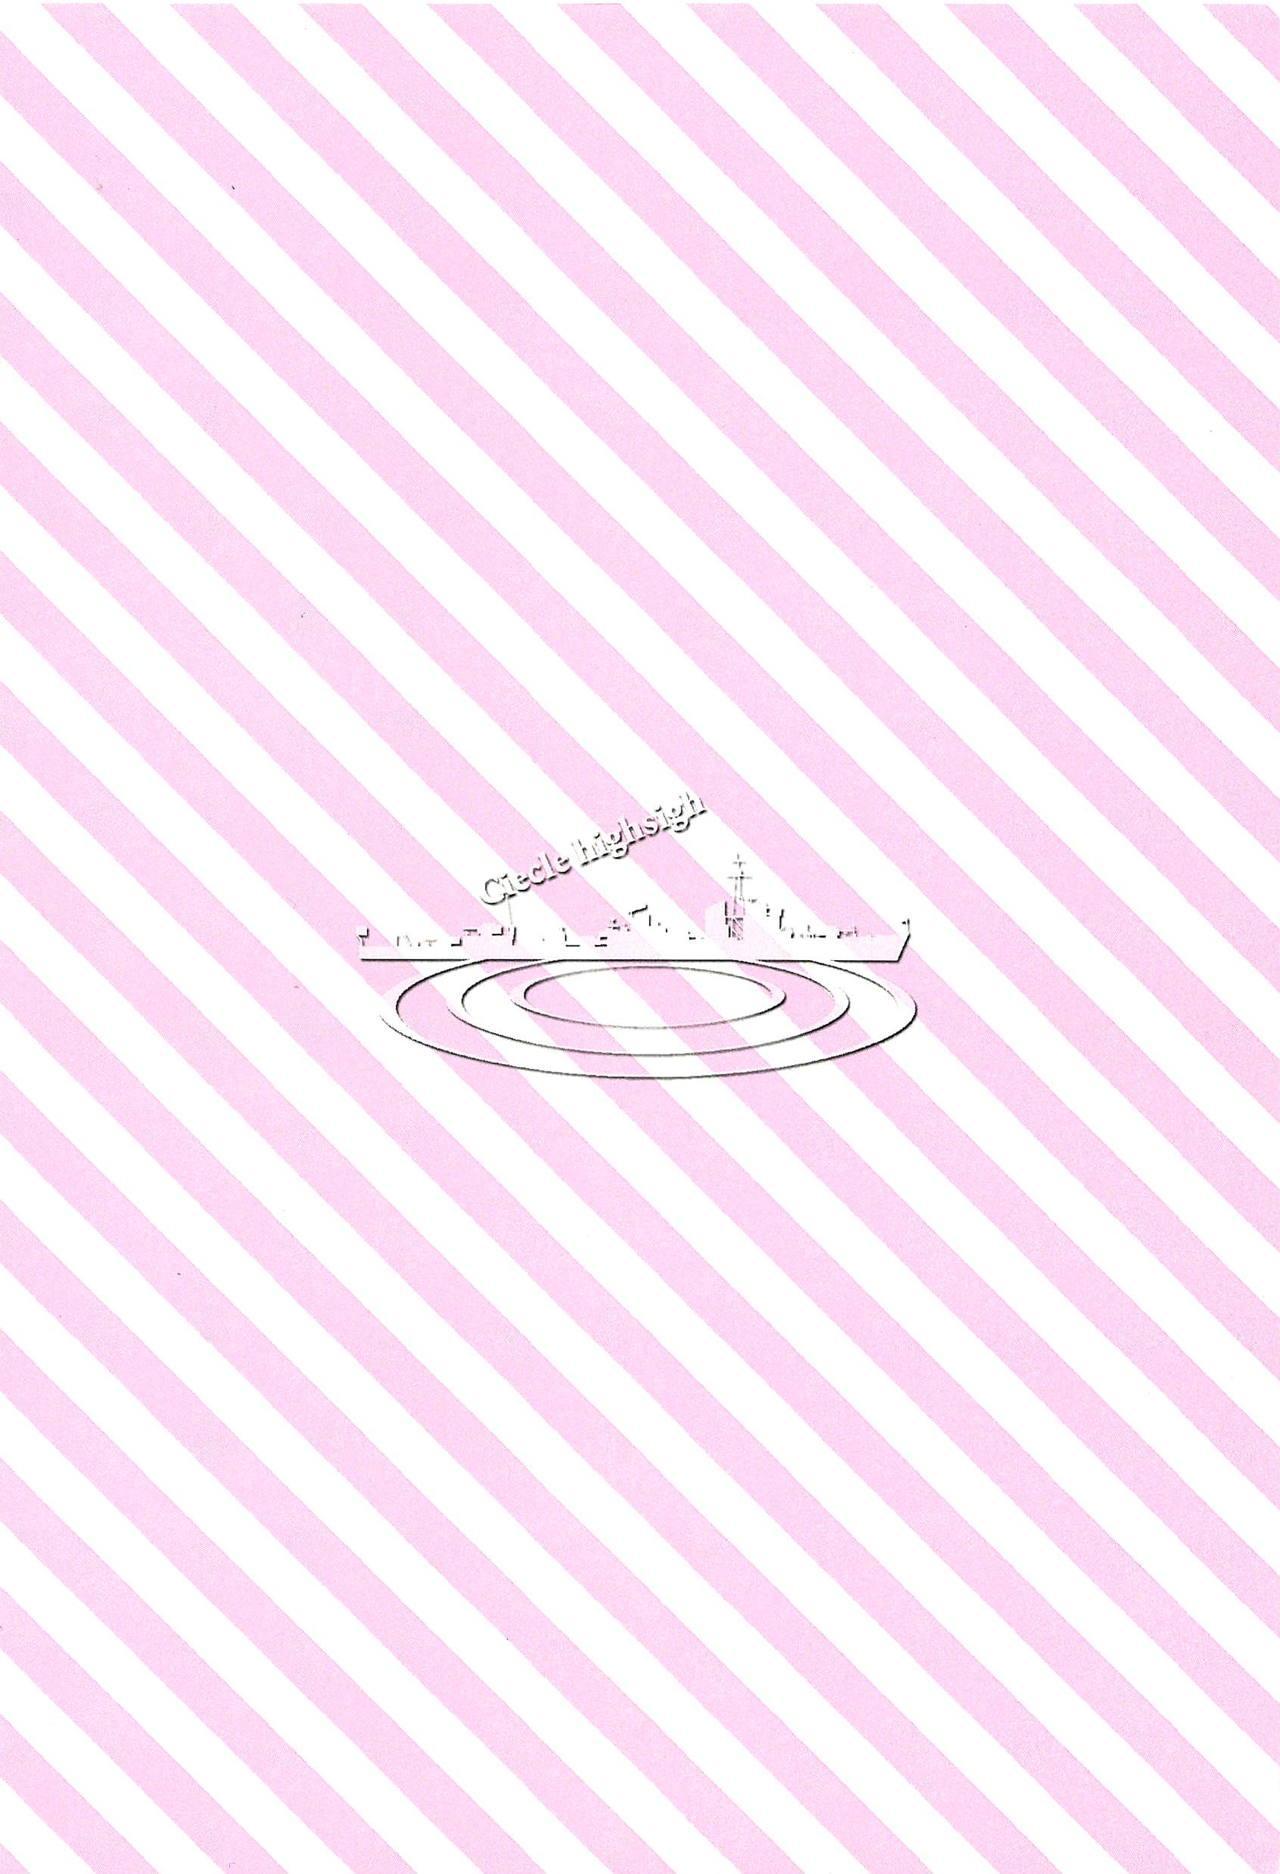 MURAKUMO Collection 5.5 13